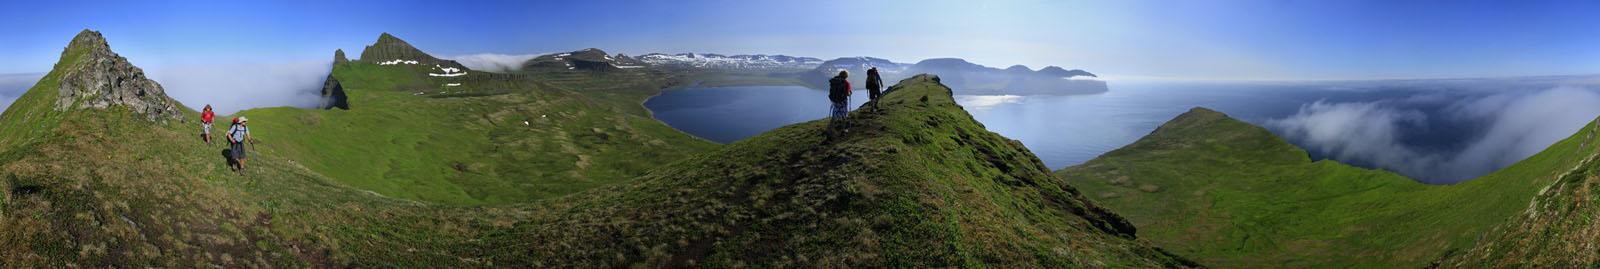 two,hikers,composite,panorama,double,locations,Hornstrandir Peninsula,Iceland,Westfiords,Hornsbjarg, photo